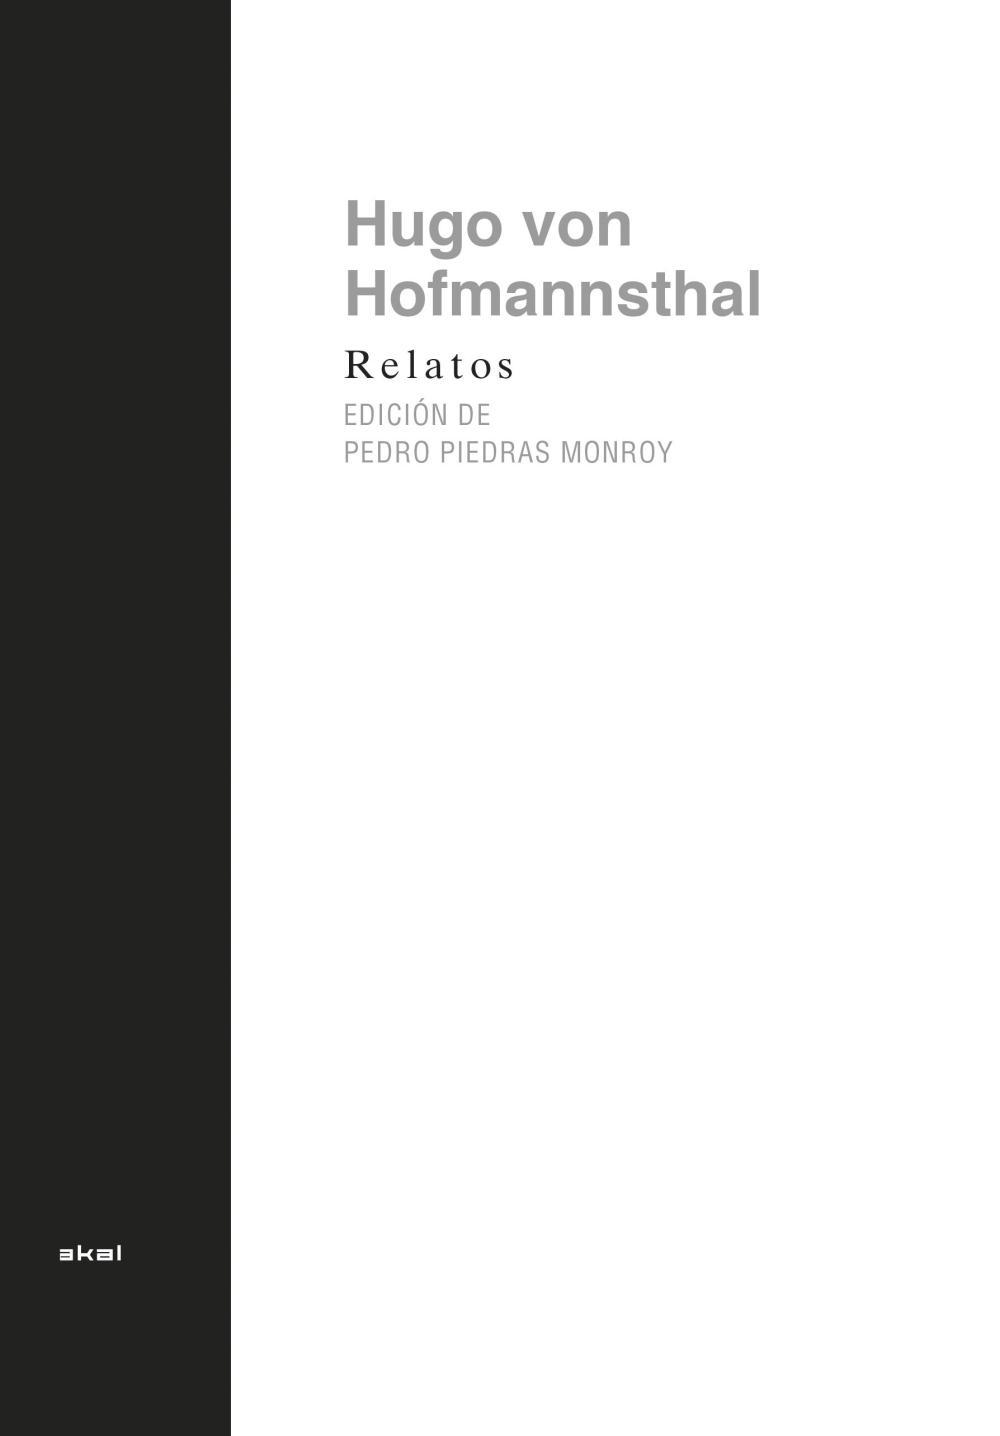 Relatos de Hofmannsthal